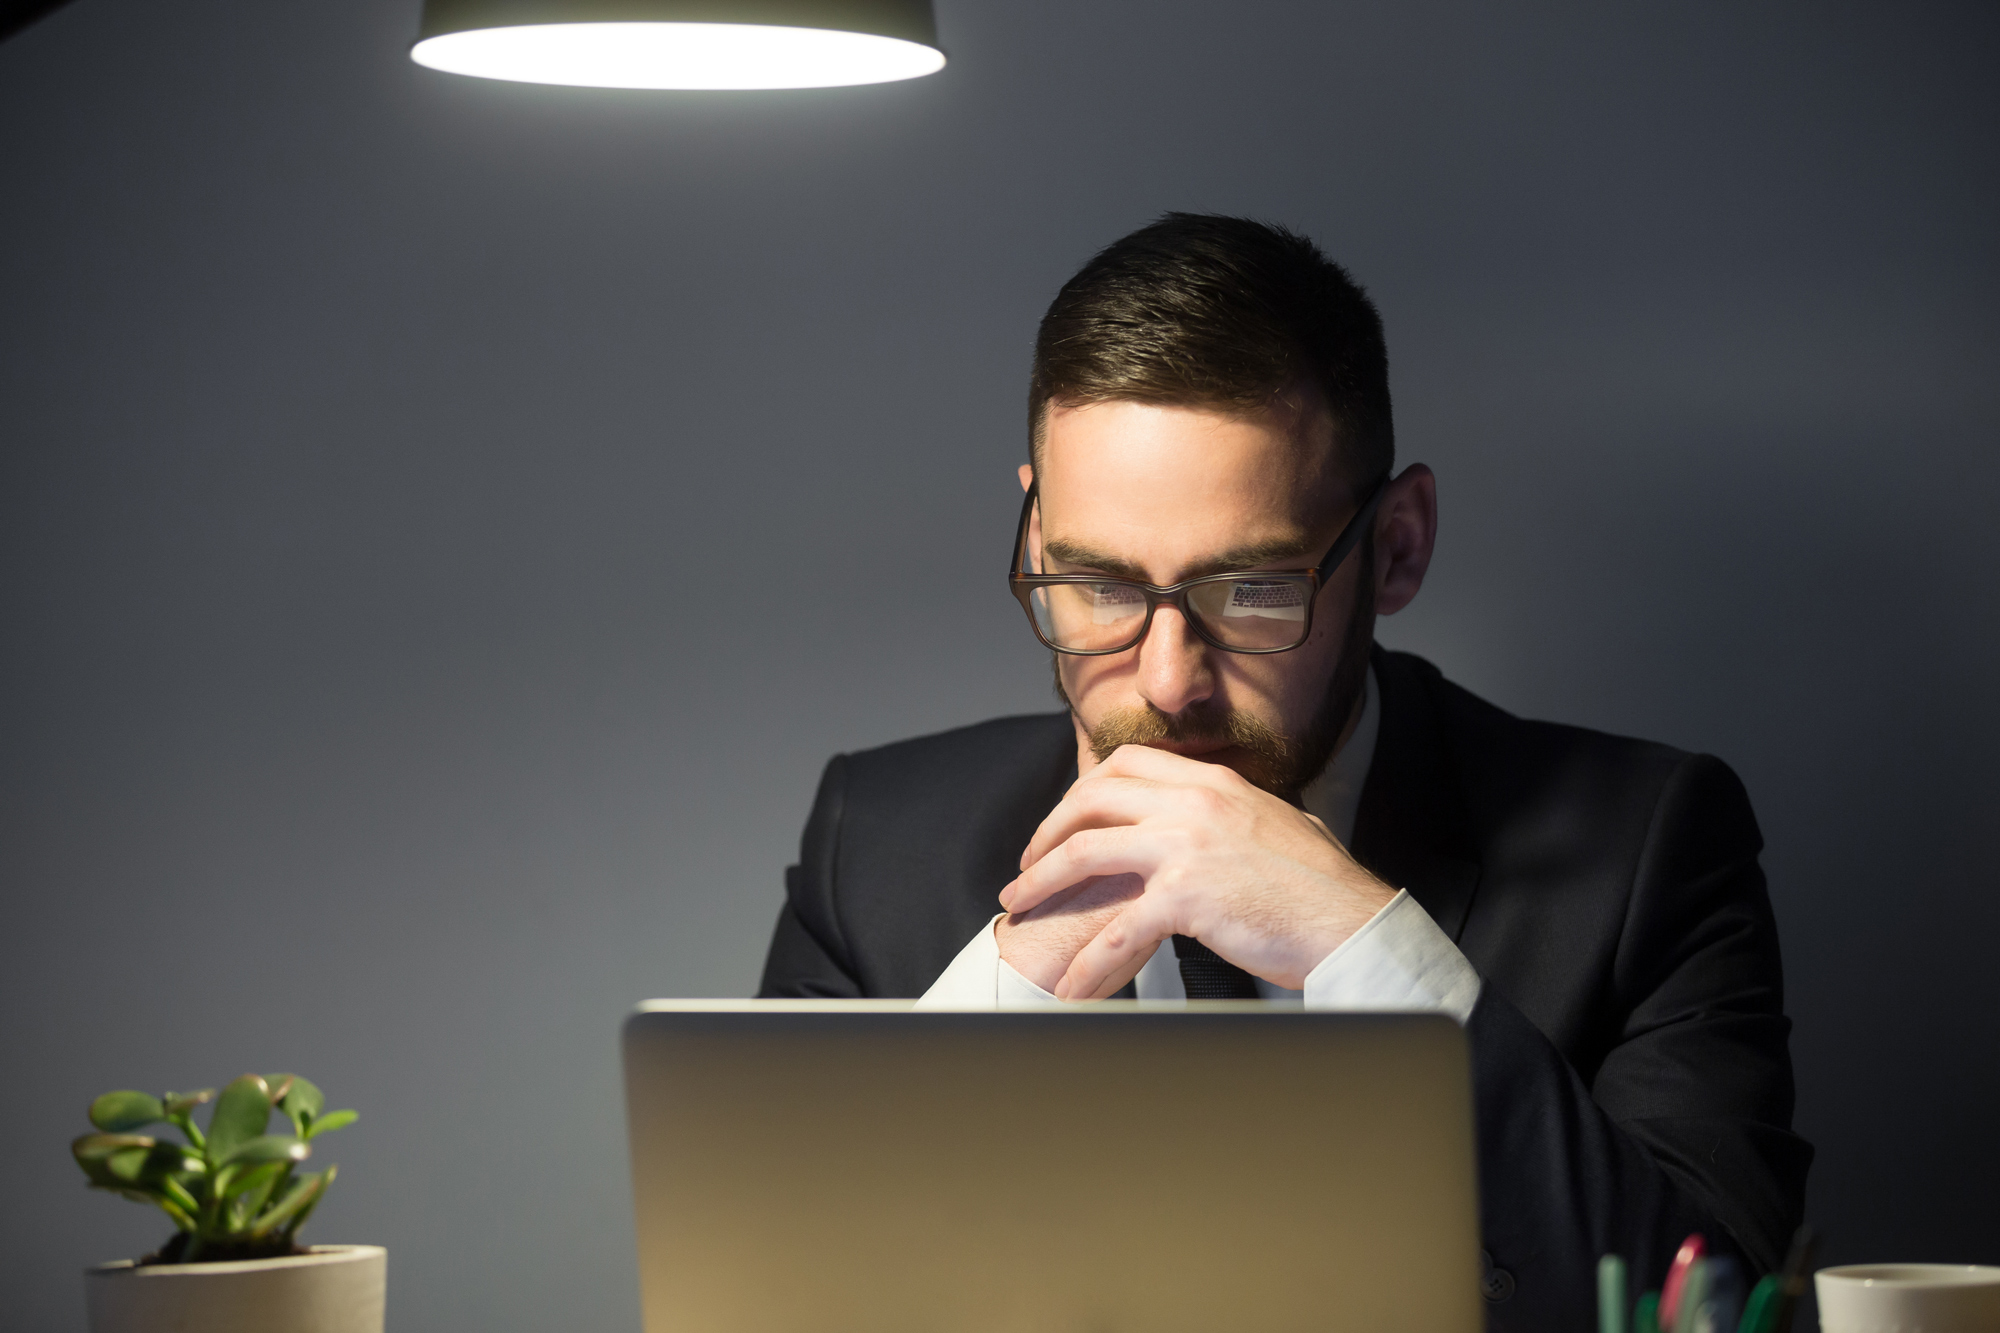 Solving Logistics CEOs Challenges